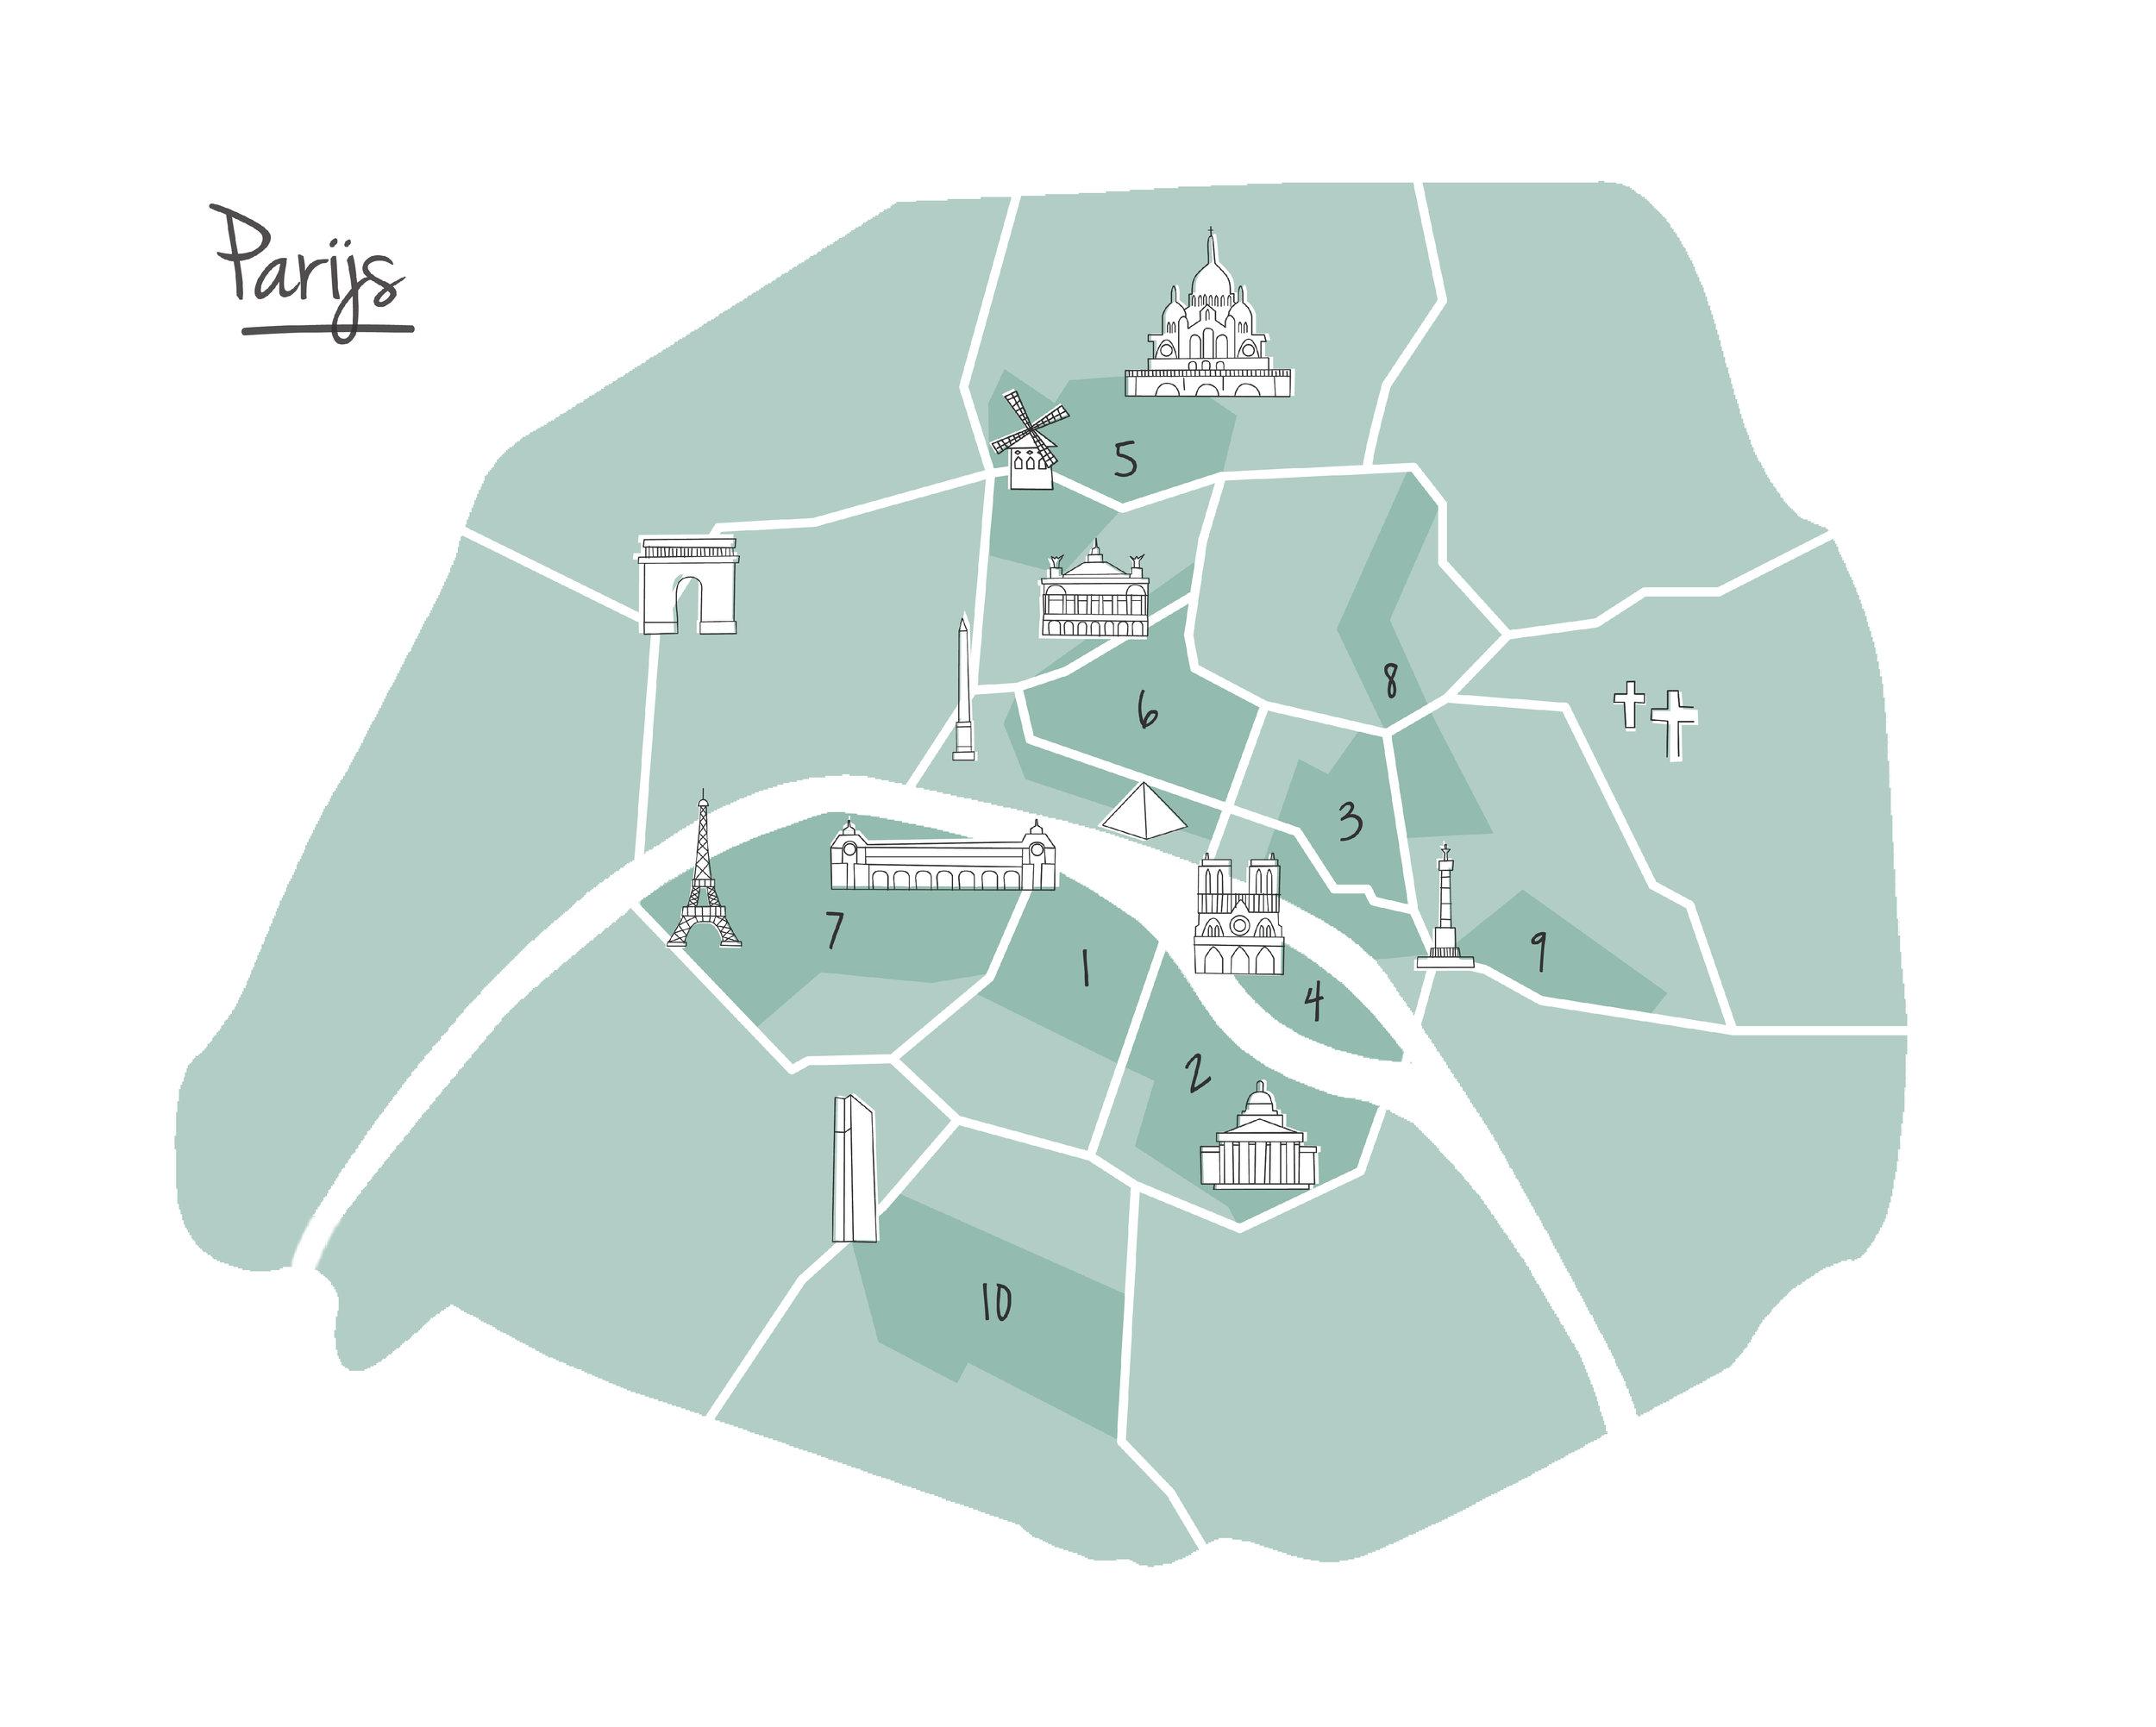 parijs-map.jpg